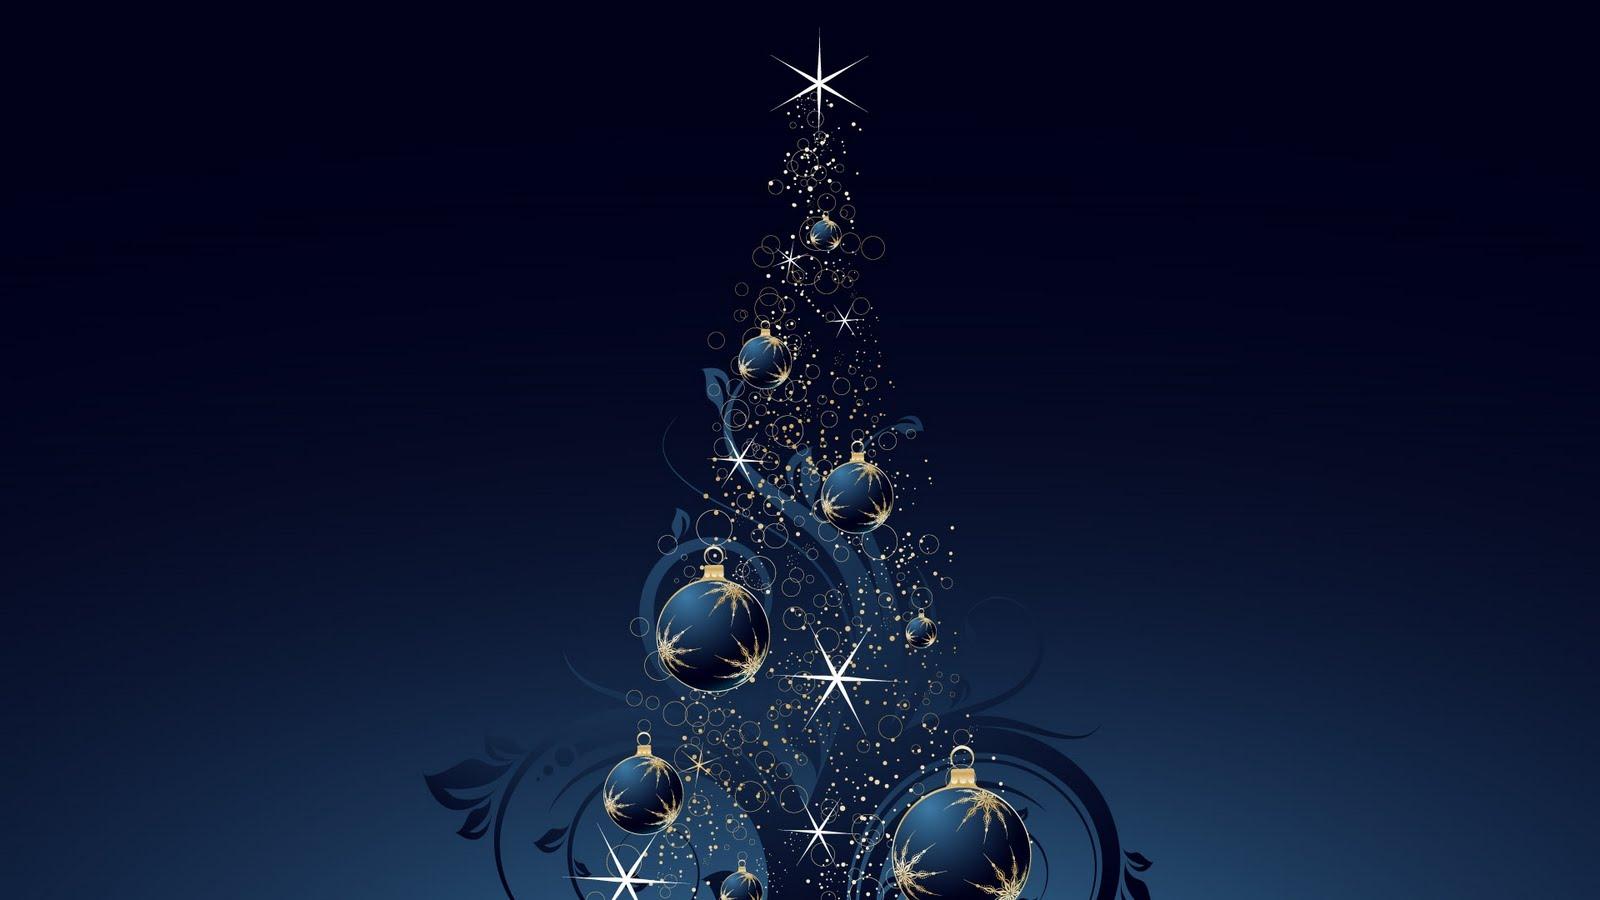 Blue Christmas Background | Hd Wallpaper